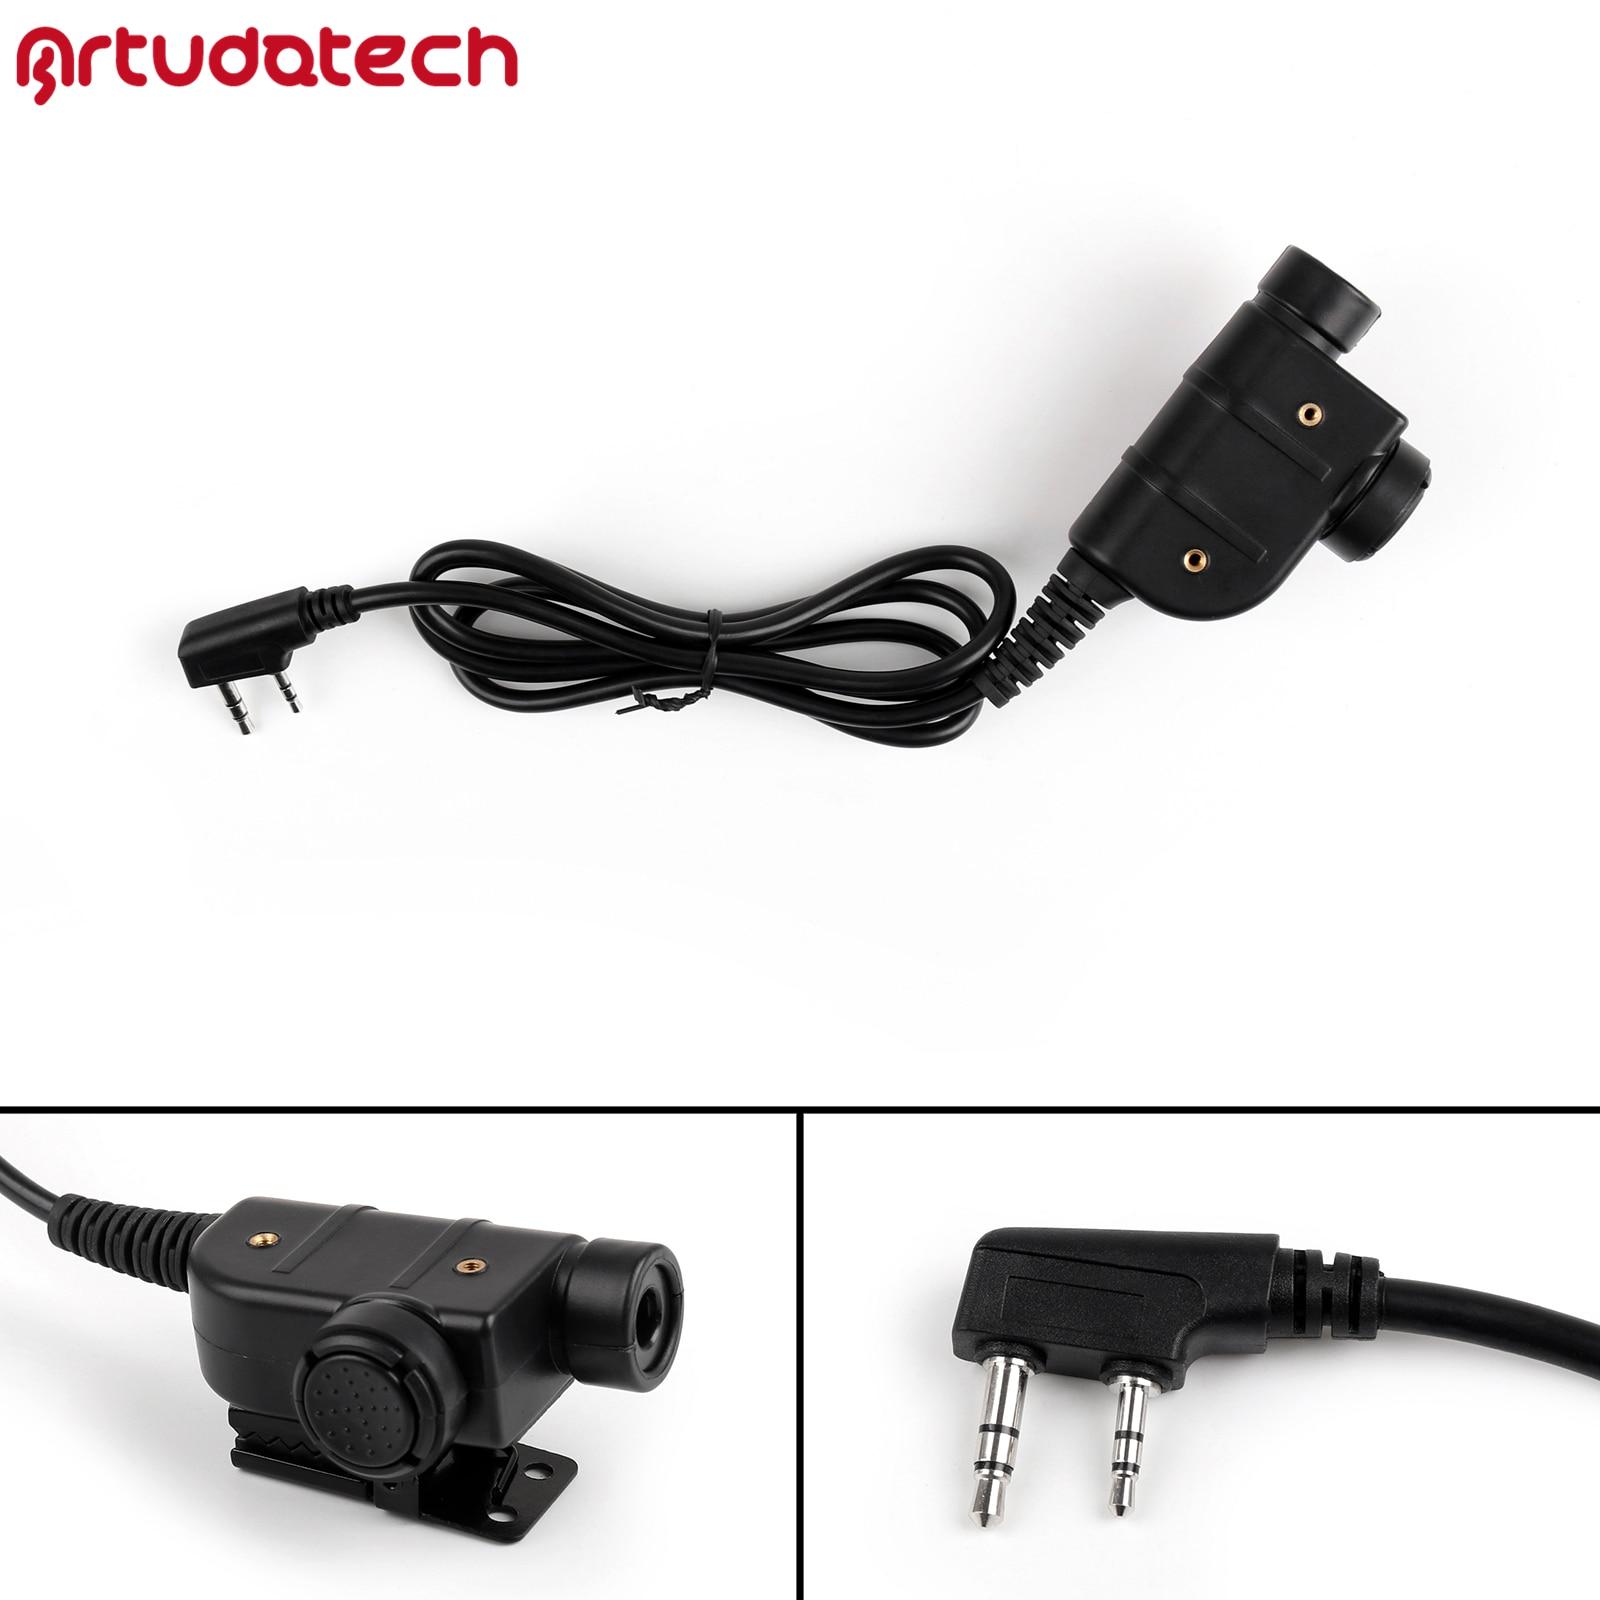 Artudatech Z-TAC Z125 Silynx Releases Chest U94 PTT For Kenwood Communication Headset For IASUS UHF Transceiver Pro Radio